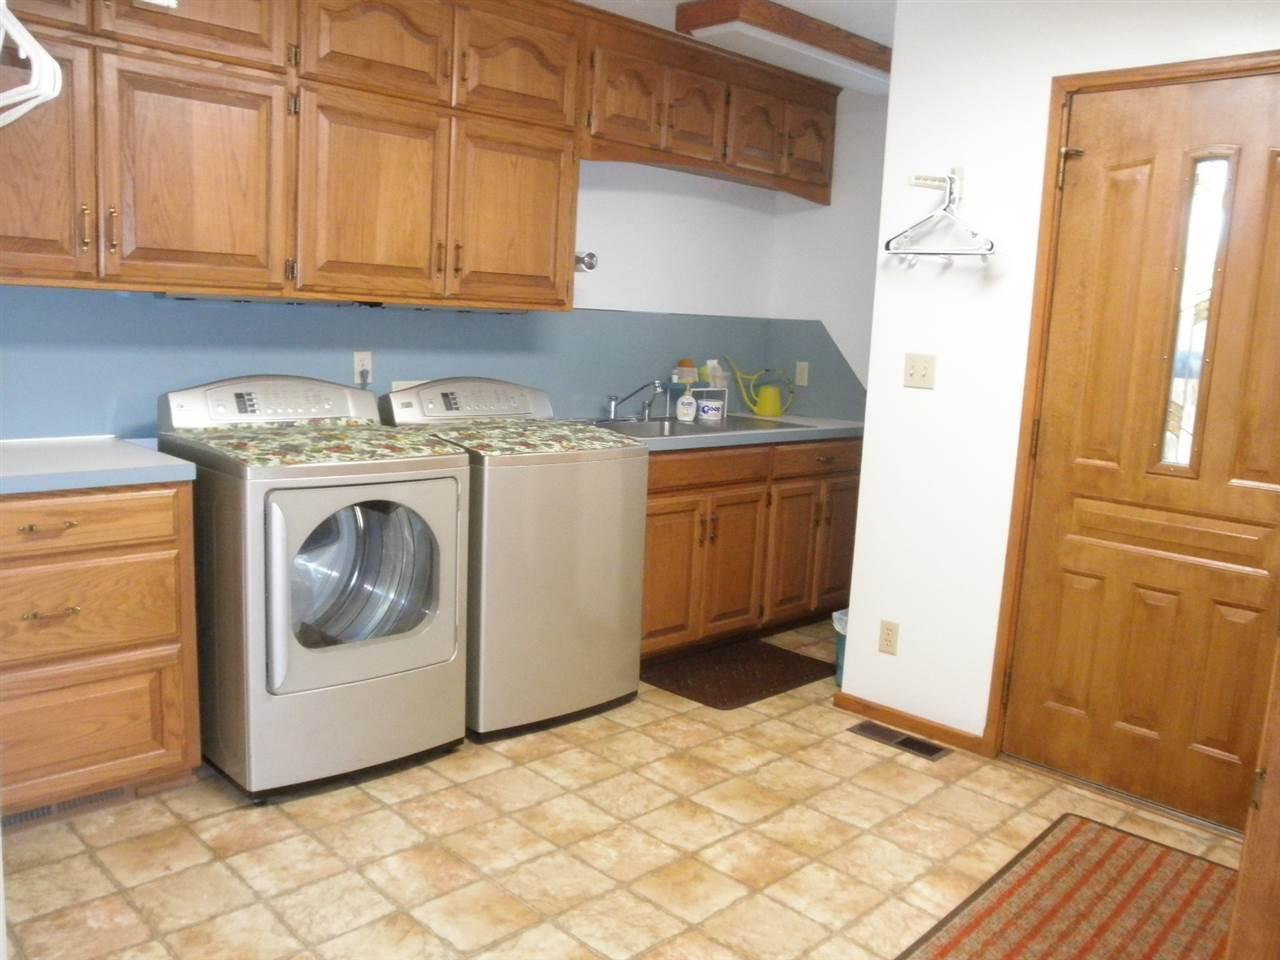 Sold Cross Sale W/ MLS | 88 Elmwood  Ponca City, OK 74601 12